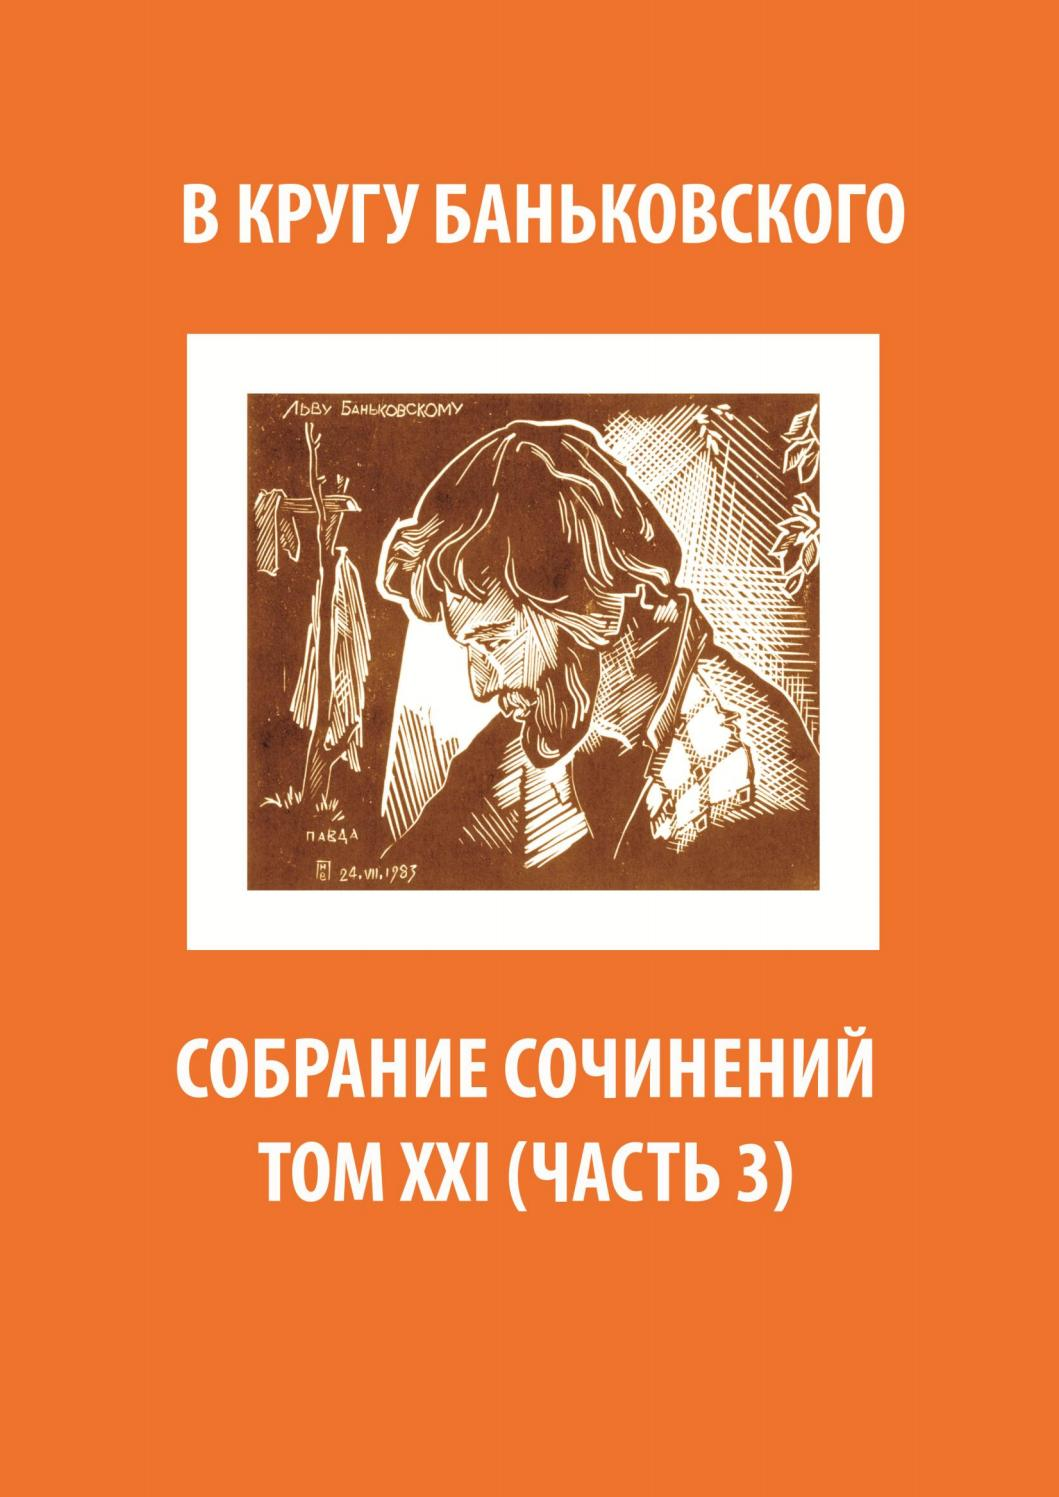 f4698340a Собрание сочинений. Том XXI. В кругу Баньковского [Выпуск 3]. - 2018 by  Bonikowski Lev - issuu